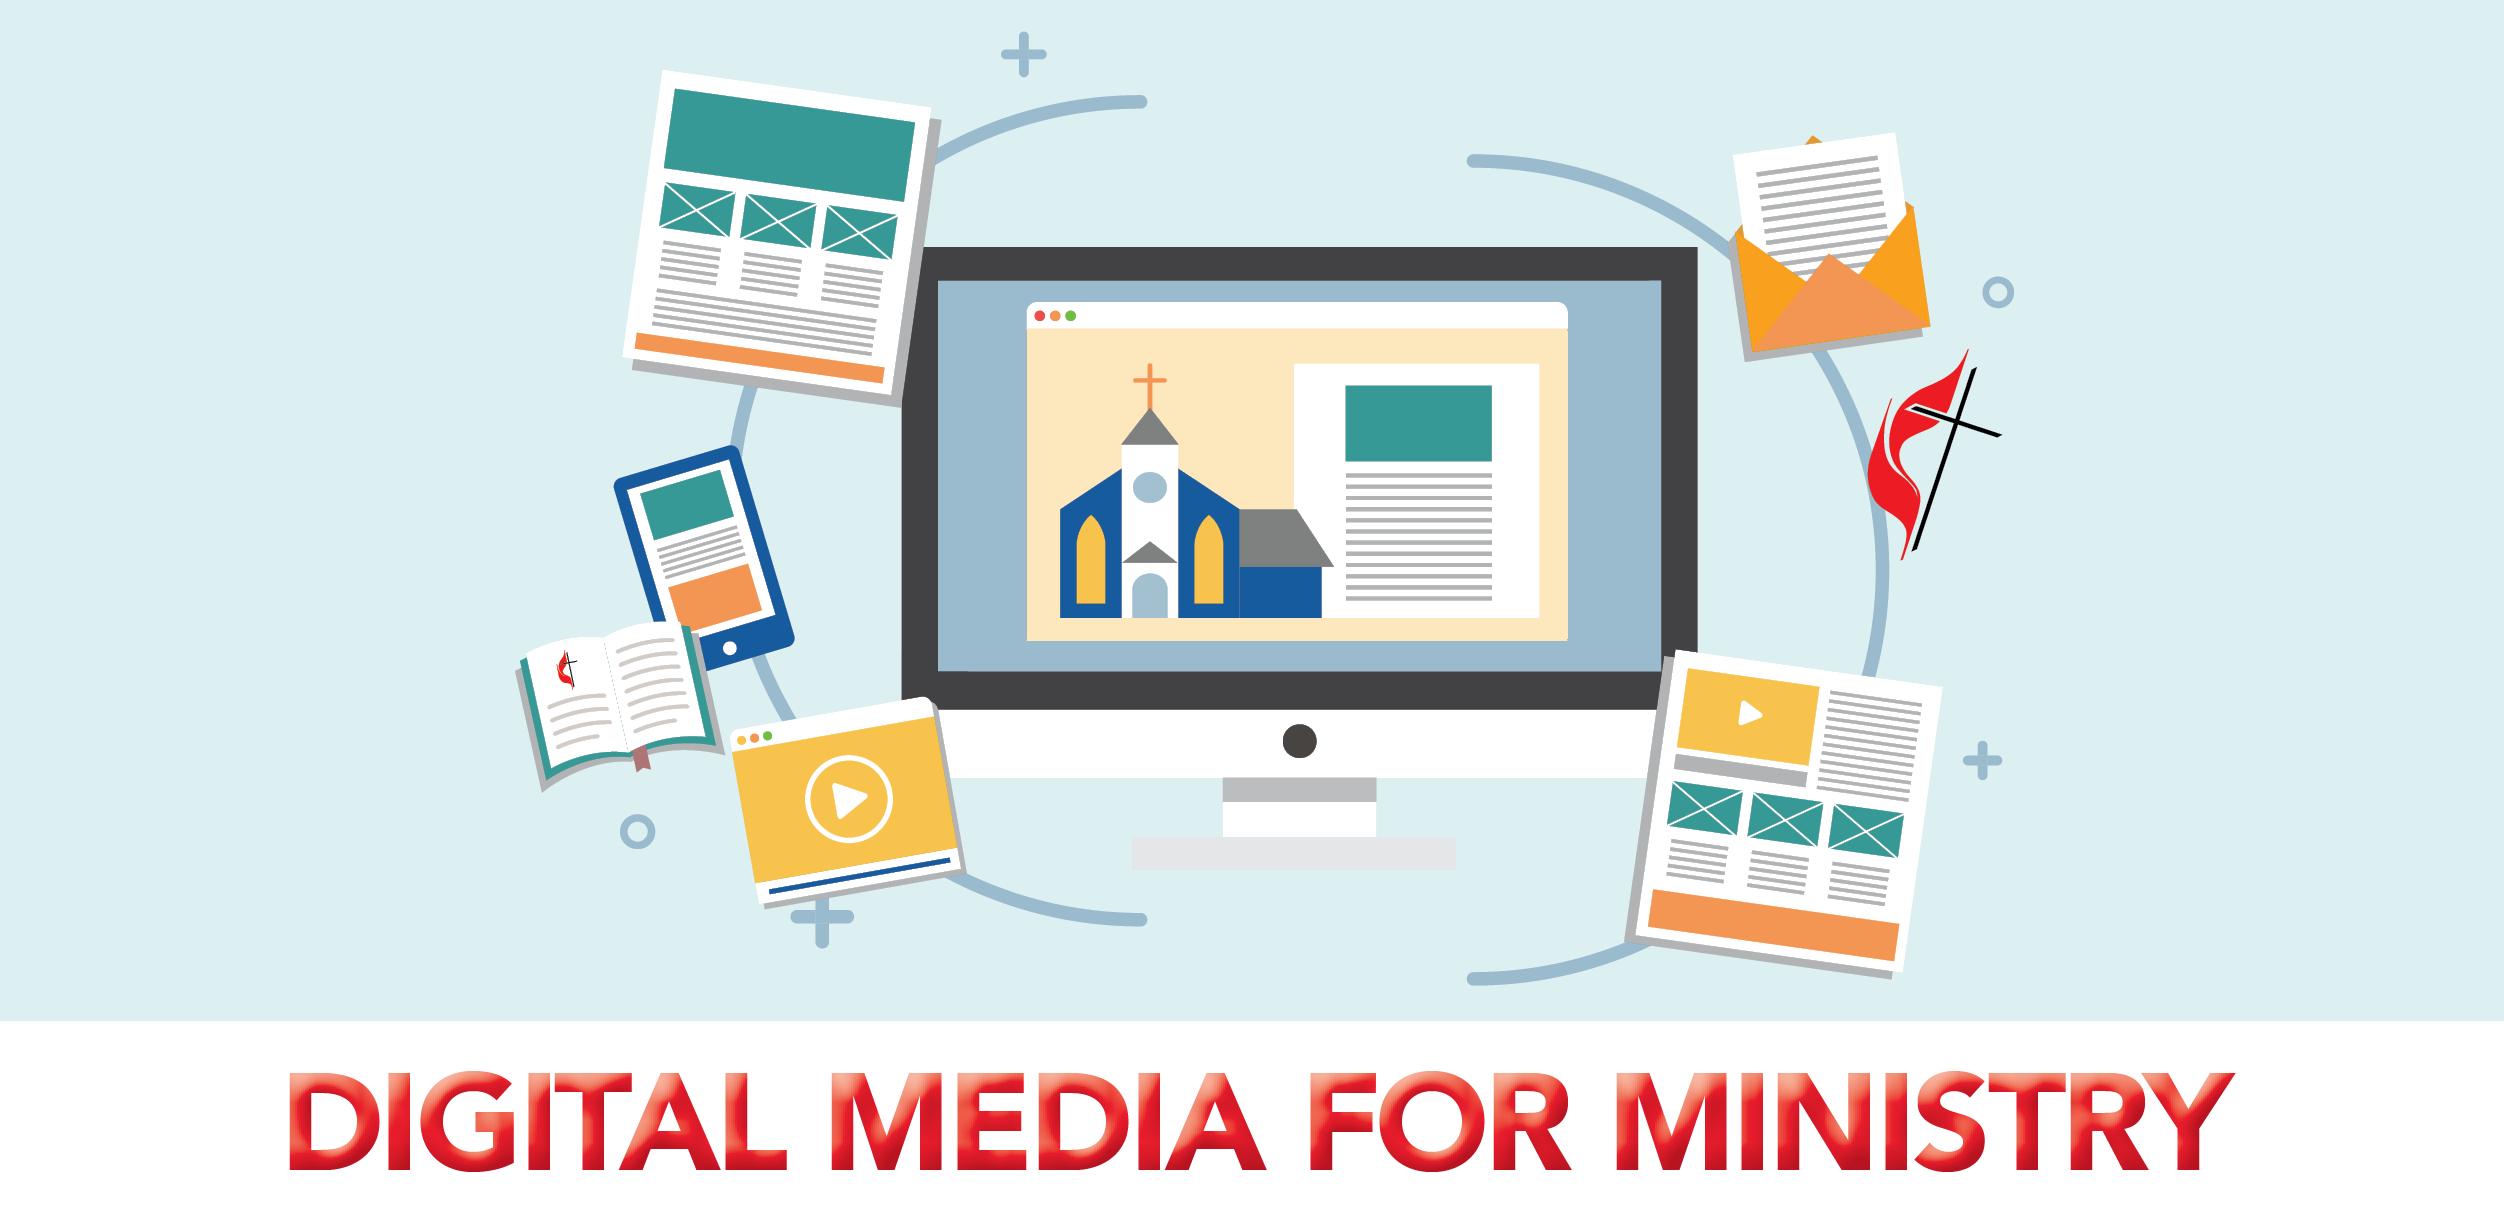 Digital Media for Ministry